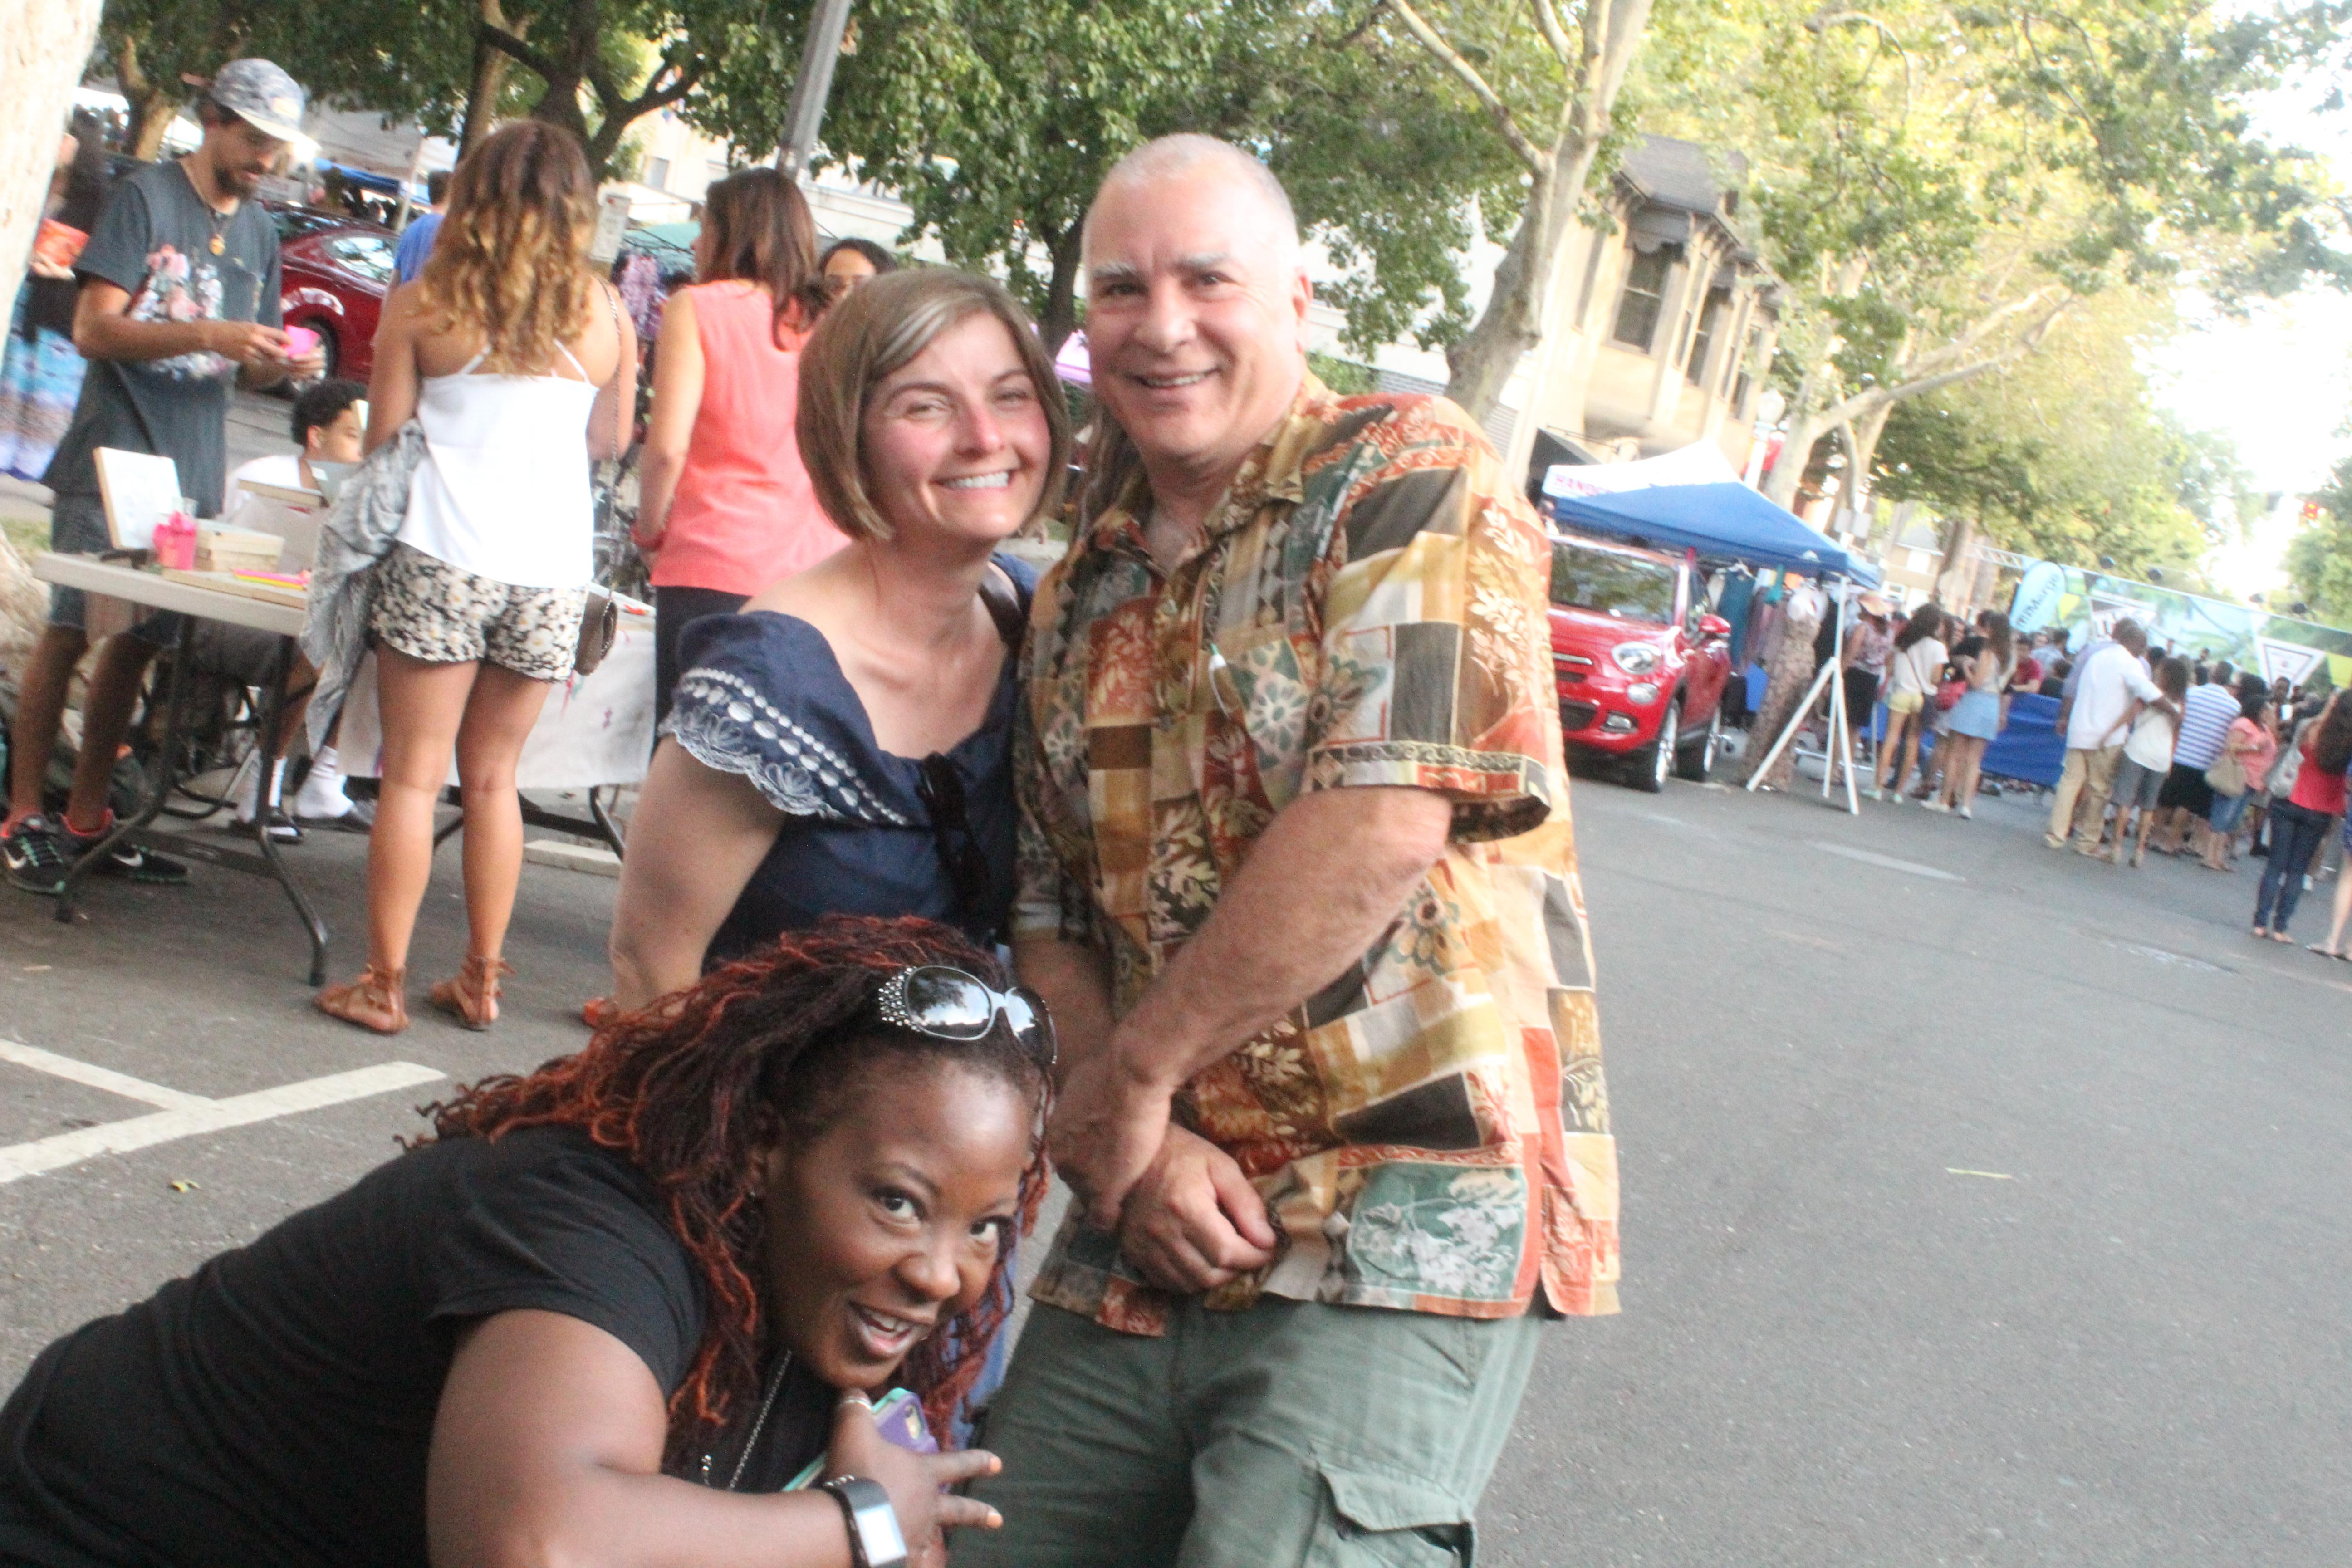 Ms. Kay, Ms. Cara, and Mr. Gary Federico